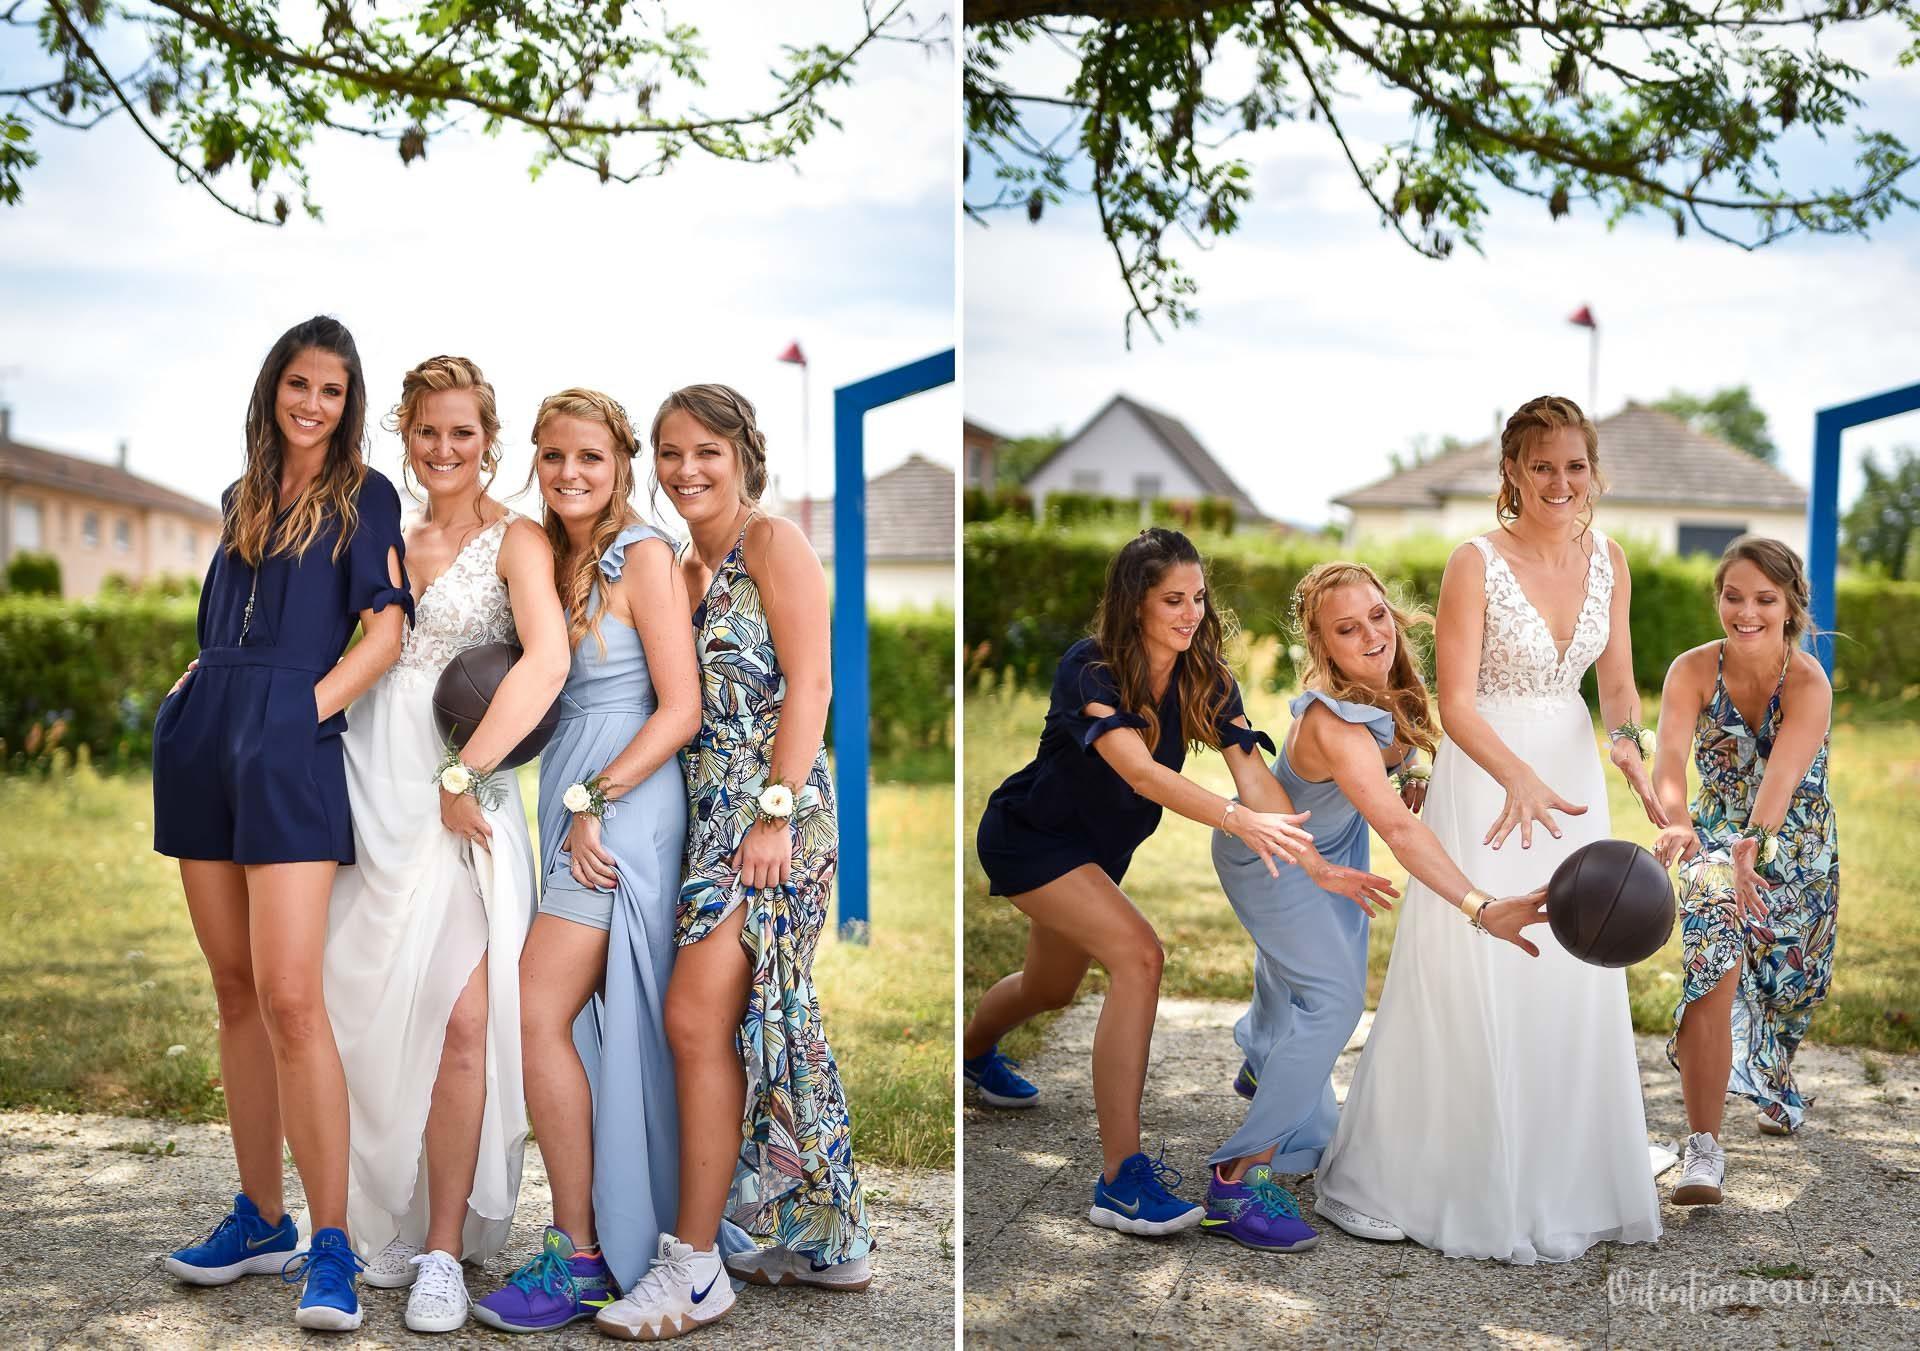 Mariage basketteurs - Valentine Poulain girls